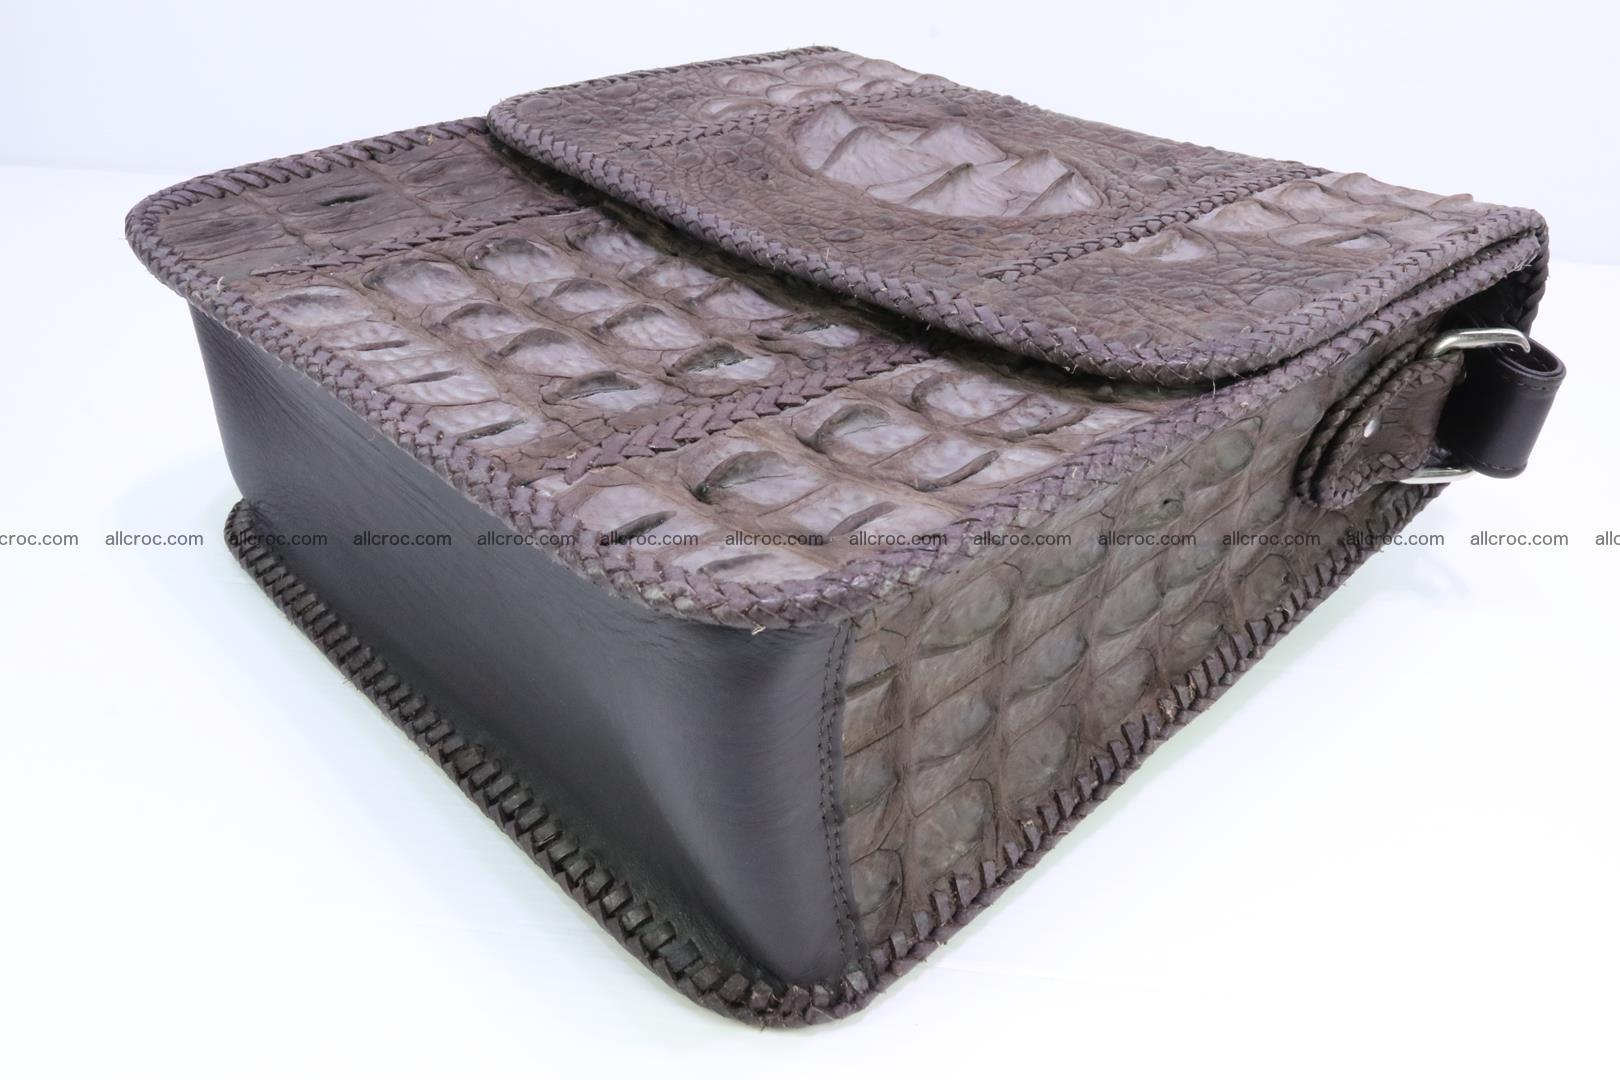 Сrocodile skin shoulder bag with braided edges 142 Foto 10